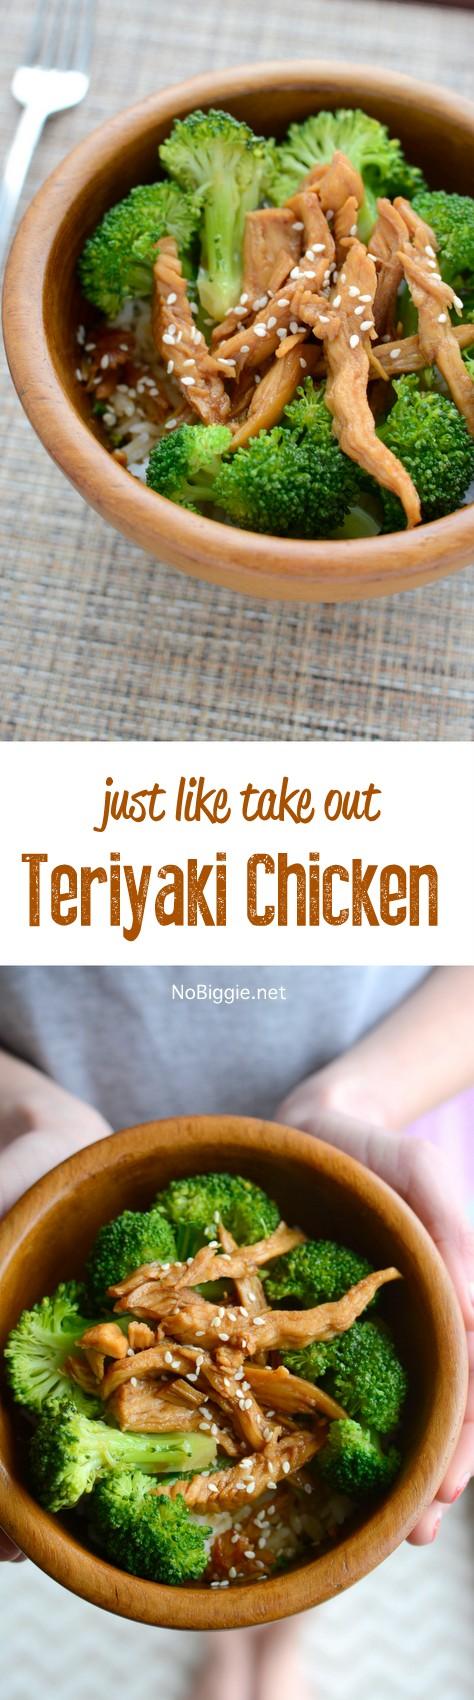 Teriyaki Chicken! So good, it tastes just like take out! | NoBiggie.net